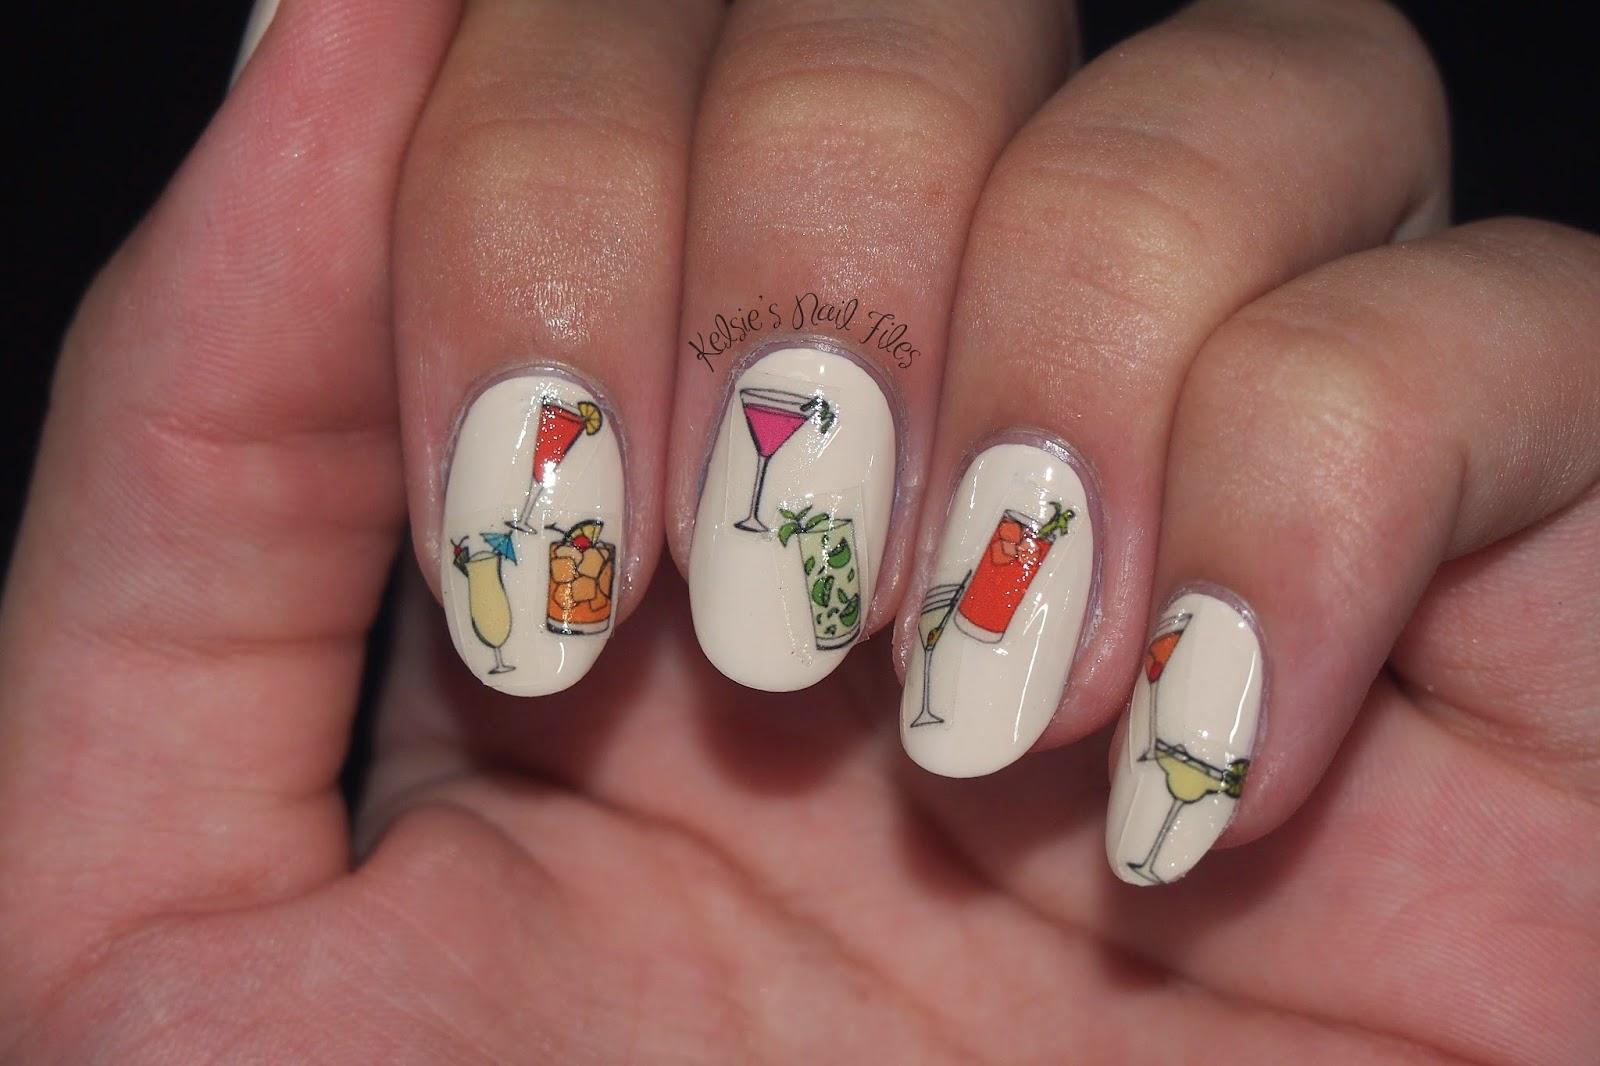 Nail Art Ideas » August Nail Art - Pictures of Nail Art Design Ideas